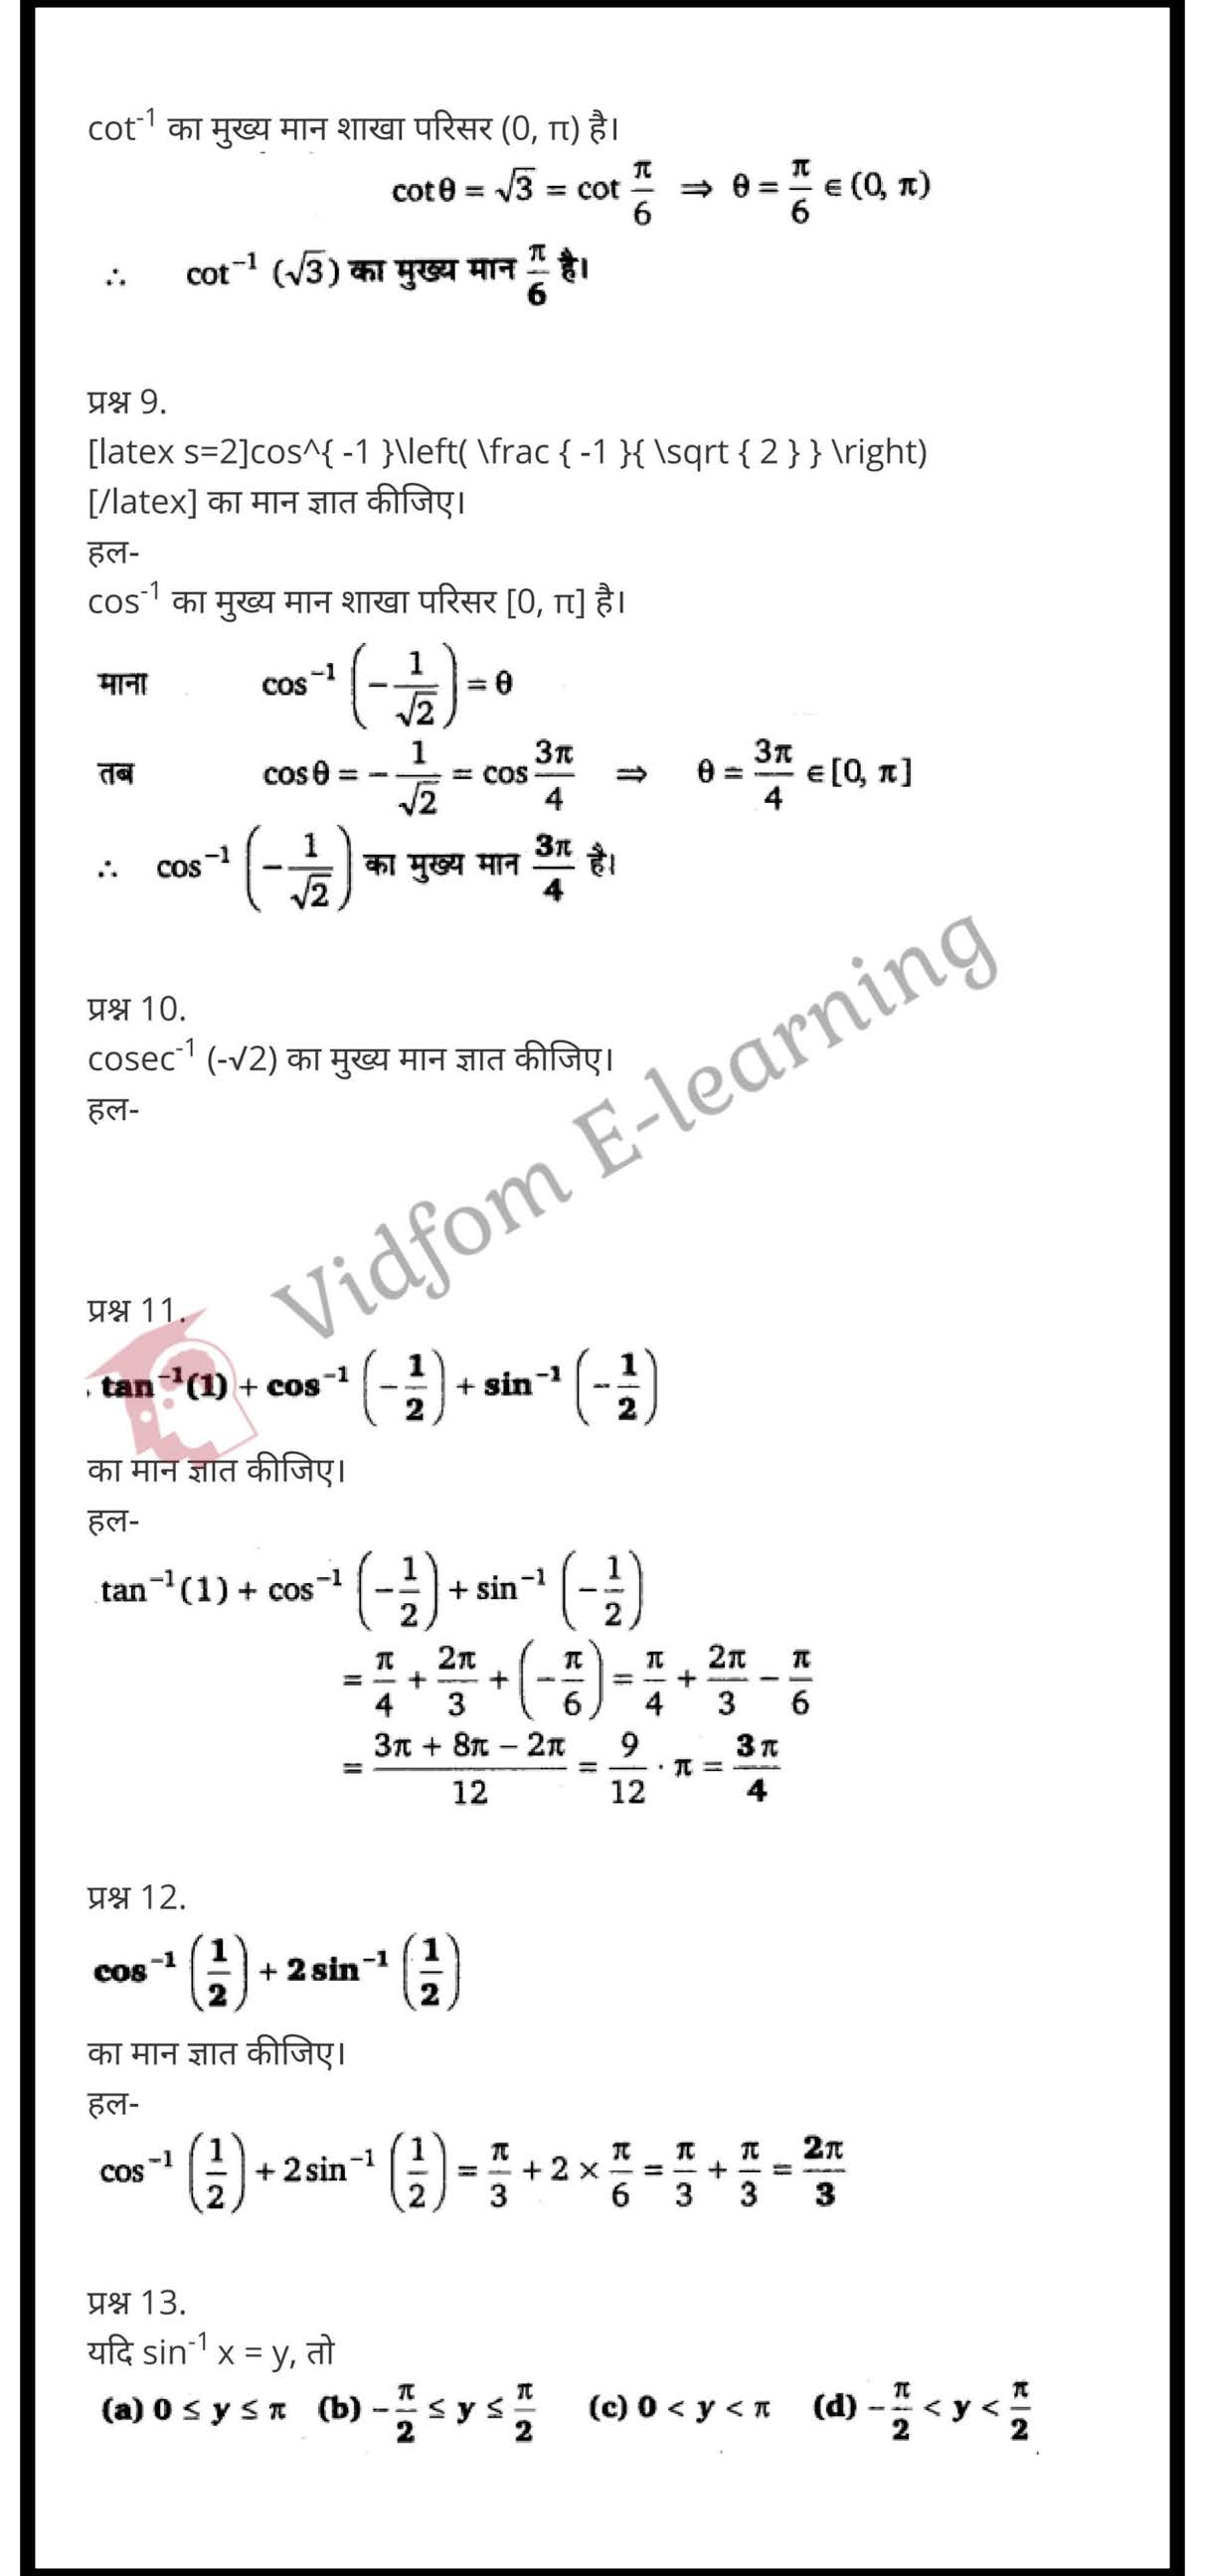 कक्षा 12 गणित  के नोट्स  हिंदी में एनसीईआरटी समाधान,     class 12 Maths Chapter 2,   class 12 Maths Chapter 2 ncert solutions in Hindi,   class 12 Maths Chapter 2 notes in hindi,   class 12 Maths Chapter 2 question answer,   class 12 Maths Chapter 2 notes,   class 12 Maths Chapter 2 class 12 Maths Chapter 2 in  hindi,    class 12 Maths Chapter 2 important questions in  hindi,   class 12 Maths Chapter 2 notes in hindi,    class 12 Maths Chapter 2 test,   class 12 Maths Chapter 2 pdf,   class 12 Maths Chapter 2 notes pdf,   class 12 Maths Chapter 2 exercise solutions,   class 12 Maths Chapter 2 notes study rankers,   class 12 Maths Chapter 2 notes,    class 12 Maths Chapter 2  class 12  notes pdf,   class 12 Maths Chapter 2 class 12  notes  ncert,   class 12 Maths Chapter 2 class 12 pdf,   class 12 Maths Chapter 2  book,   class 12 Maths Chapter 2 quiz class 12  ,    10  th class 12 Maths Chapter 2  book up board,   up board 10  th class 12 Maths Chapter 2 notes,  class 12 Maths,   class 12 Maths ncert solutions in Hindi,   class 12 Maths notes in hindi,   class 12 Maths question answer,   class 12 Maths notes,  class 12 Maths class 12 Maths Chapter 2 in  hindi,    class 12 Maths important questions in  hindi,   class 12 Maths notes in hindi,    class 12 Maths test,  class 12 Maths class 12 Maths Chapter 2 pdf,   class 12 Maths notes pdf,   class 12 Maths exercise solutions,   class 12 Maths,  class 12 Maths notes study rankers,   class 12 Maths notes,  class 12 Maths notes,   class 12 Maths  class 12  notes pdf,   class 12 Maths class 12  notes  ncert,   class 12 Maths class 12 pdf,   class 12 Maths  book,  class 12 Maths quiz class 12  ,  10  th class 12 Maths    book up board,    up board 10  th class 12 Maths notes,      कक्षा 12 गणित अध्याय 2 ,  कक्षा 12 गणित, कक्षा 12 गणित अध्याय 2  के नोट्स हिंदी में,  कक्षा 12 का हिंदी अध्याय 2 का प्रश्न उत्तर,  कक्षा 12 गणित अध्याय 2 के नोट्स,  10 कक्षा गणित  हिंदी में, कक्षा 12 गणित अध्याय 2  हिंदी में,  कक्षा 12 गणित अध्याय